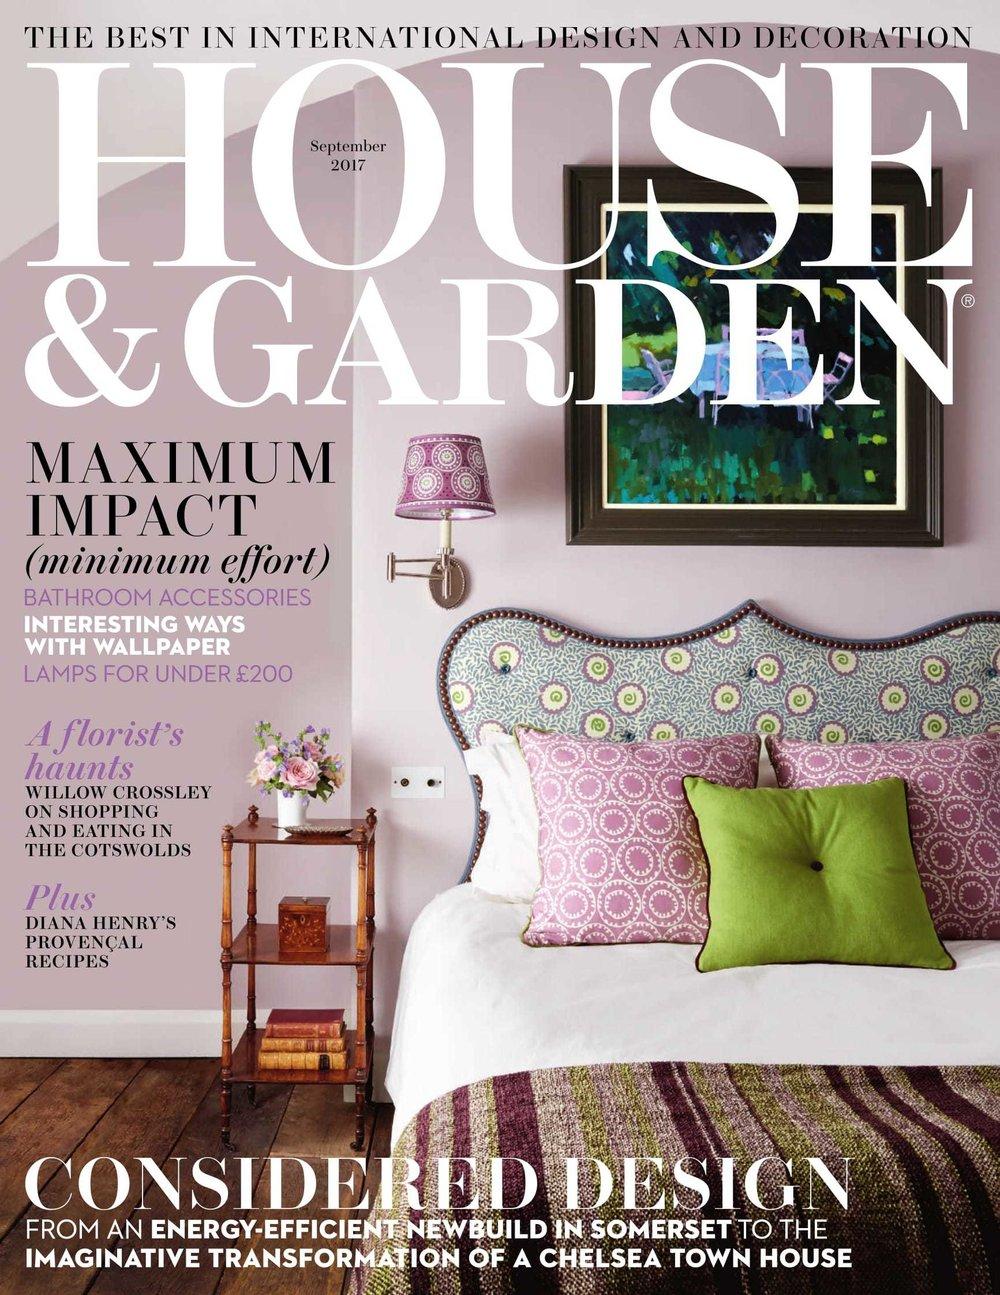 bridget-arsenault-house-and-garden-print-2017-09-a.jpg